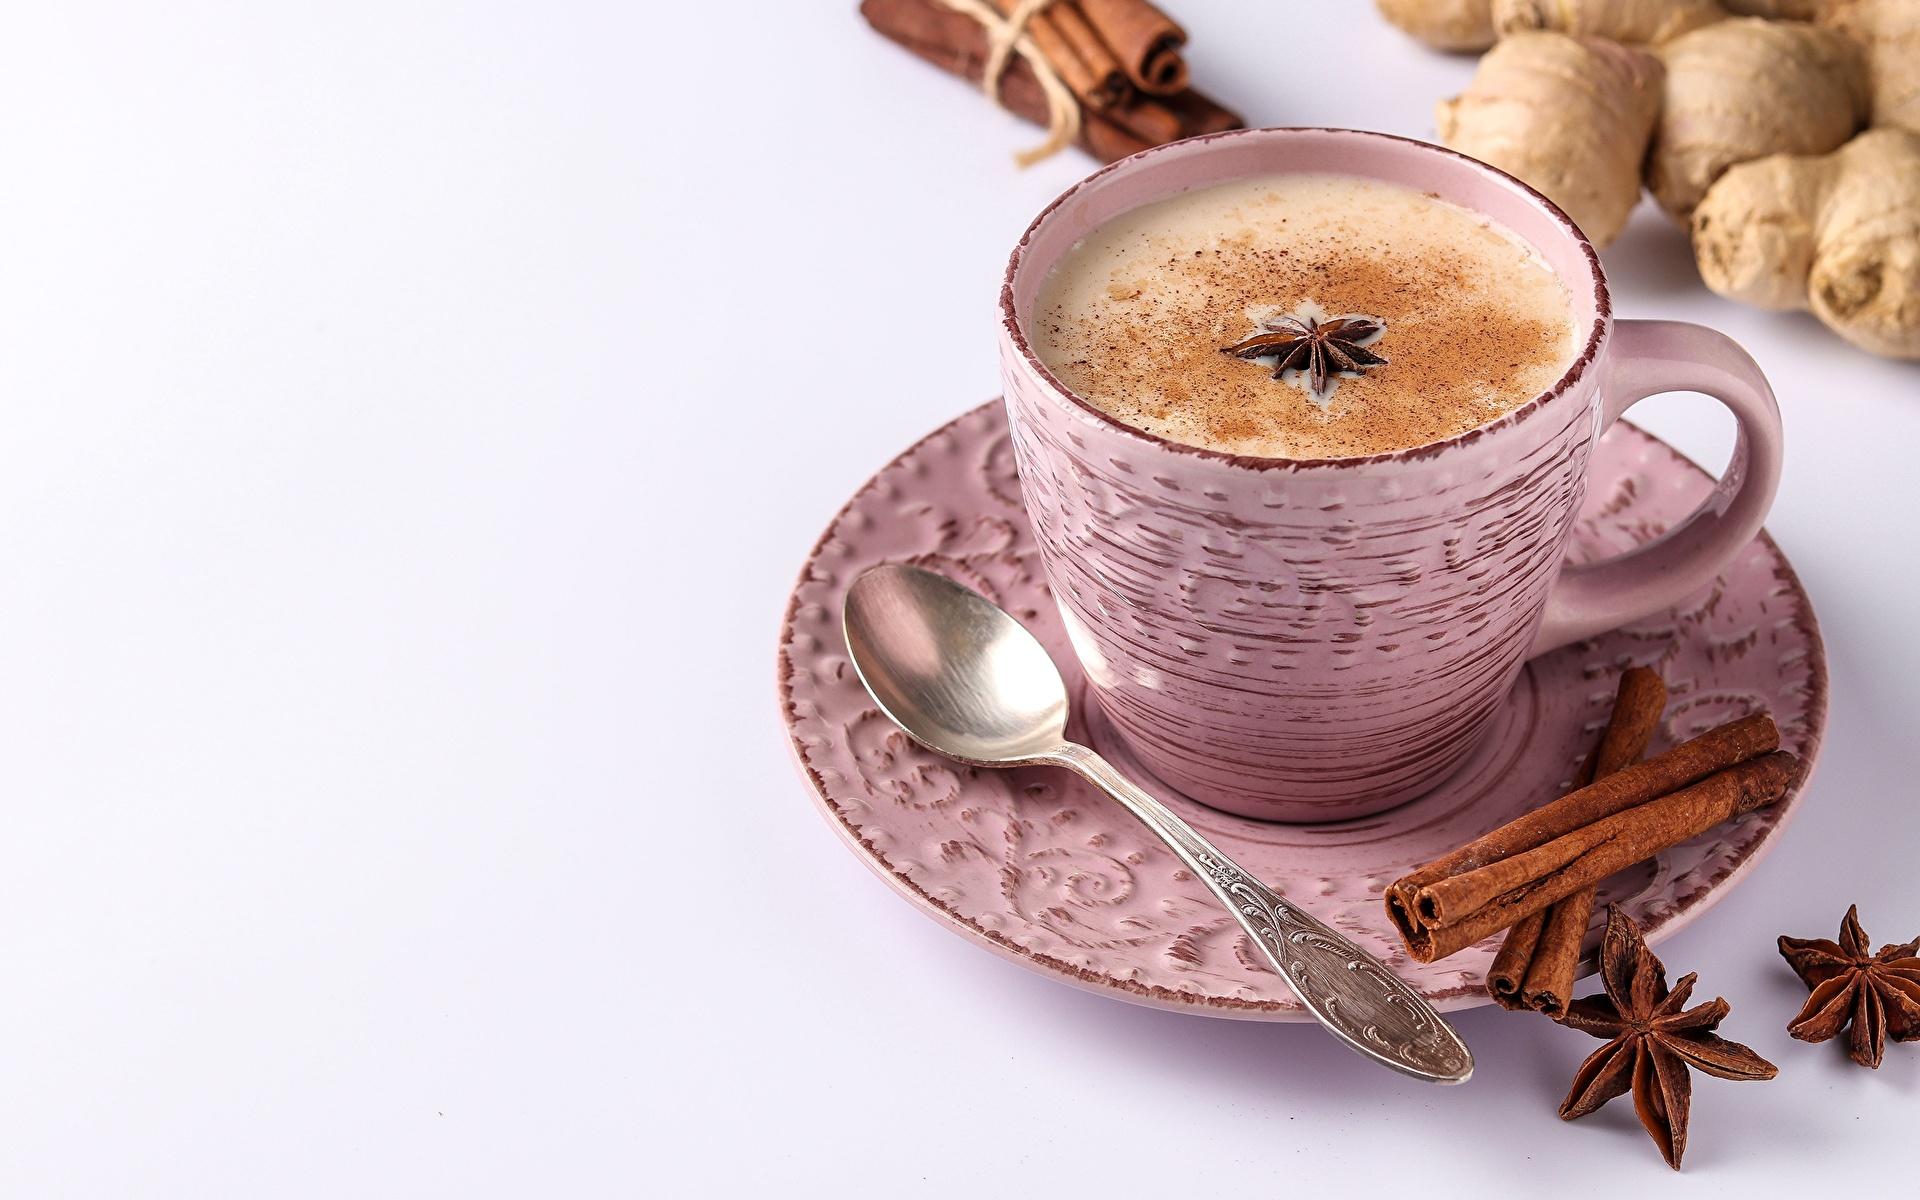 Photos Coffee Cappuccino Star anise Illicium Cinnamon Cup Foam Food Spoon Saucer 1920x1200